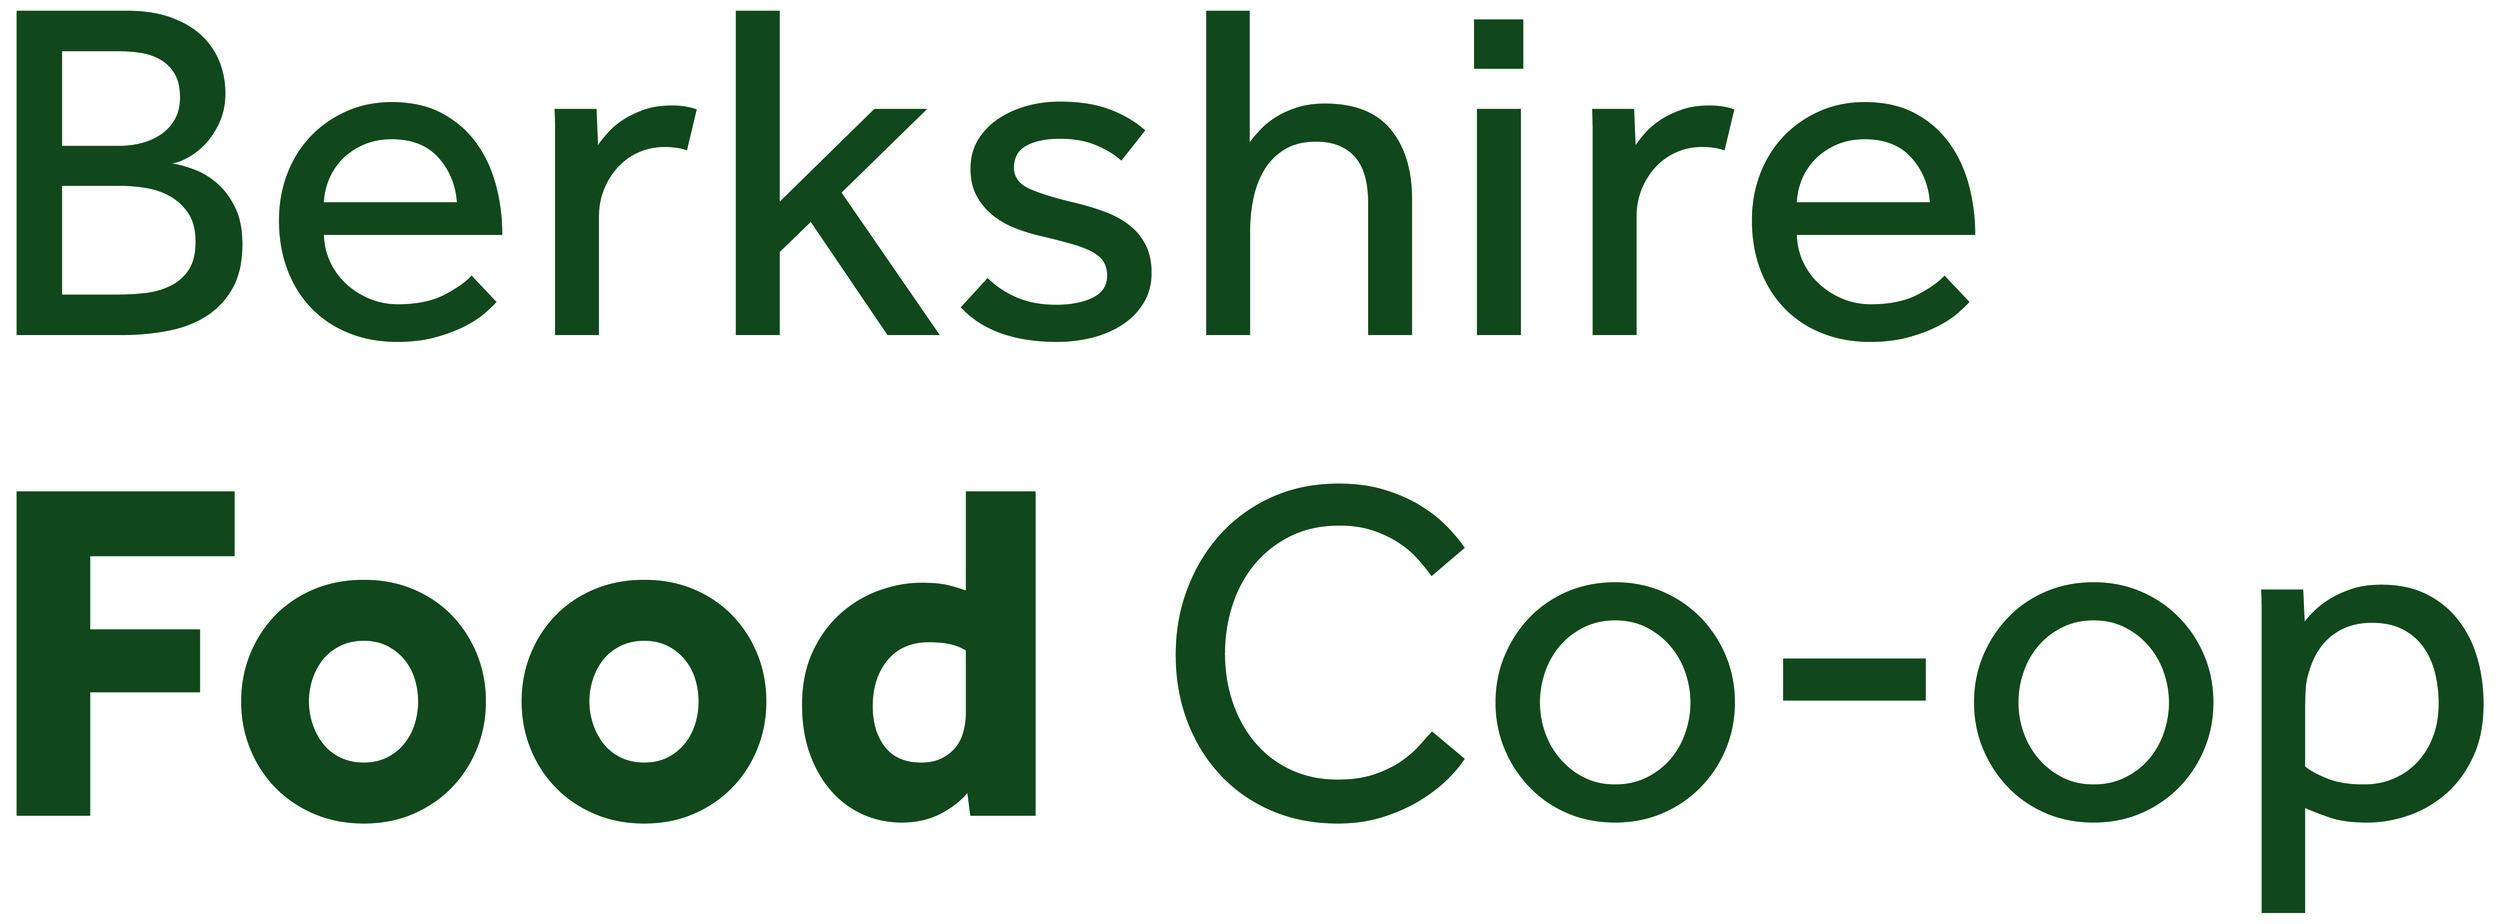 BerkshireFoodCoop_Logo_TwoLine_Pantone_DarkGreen.jpg